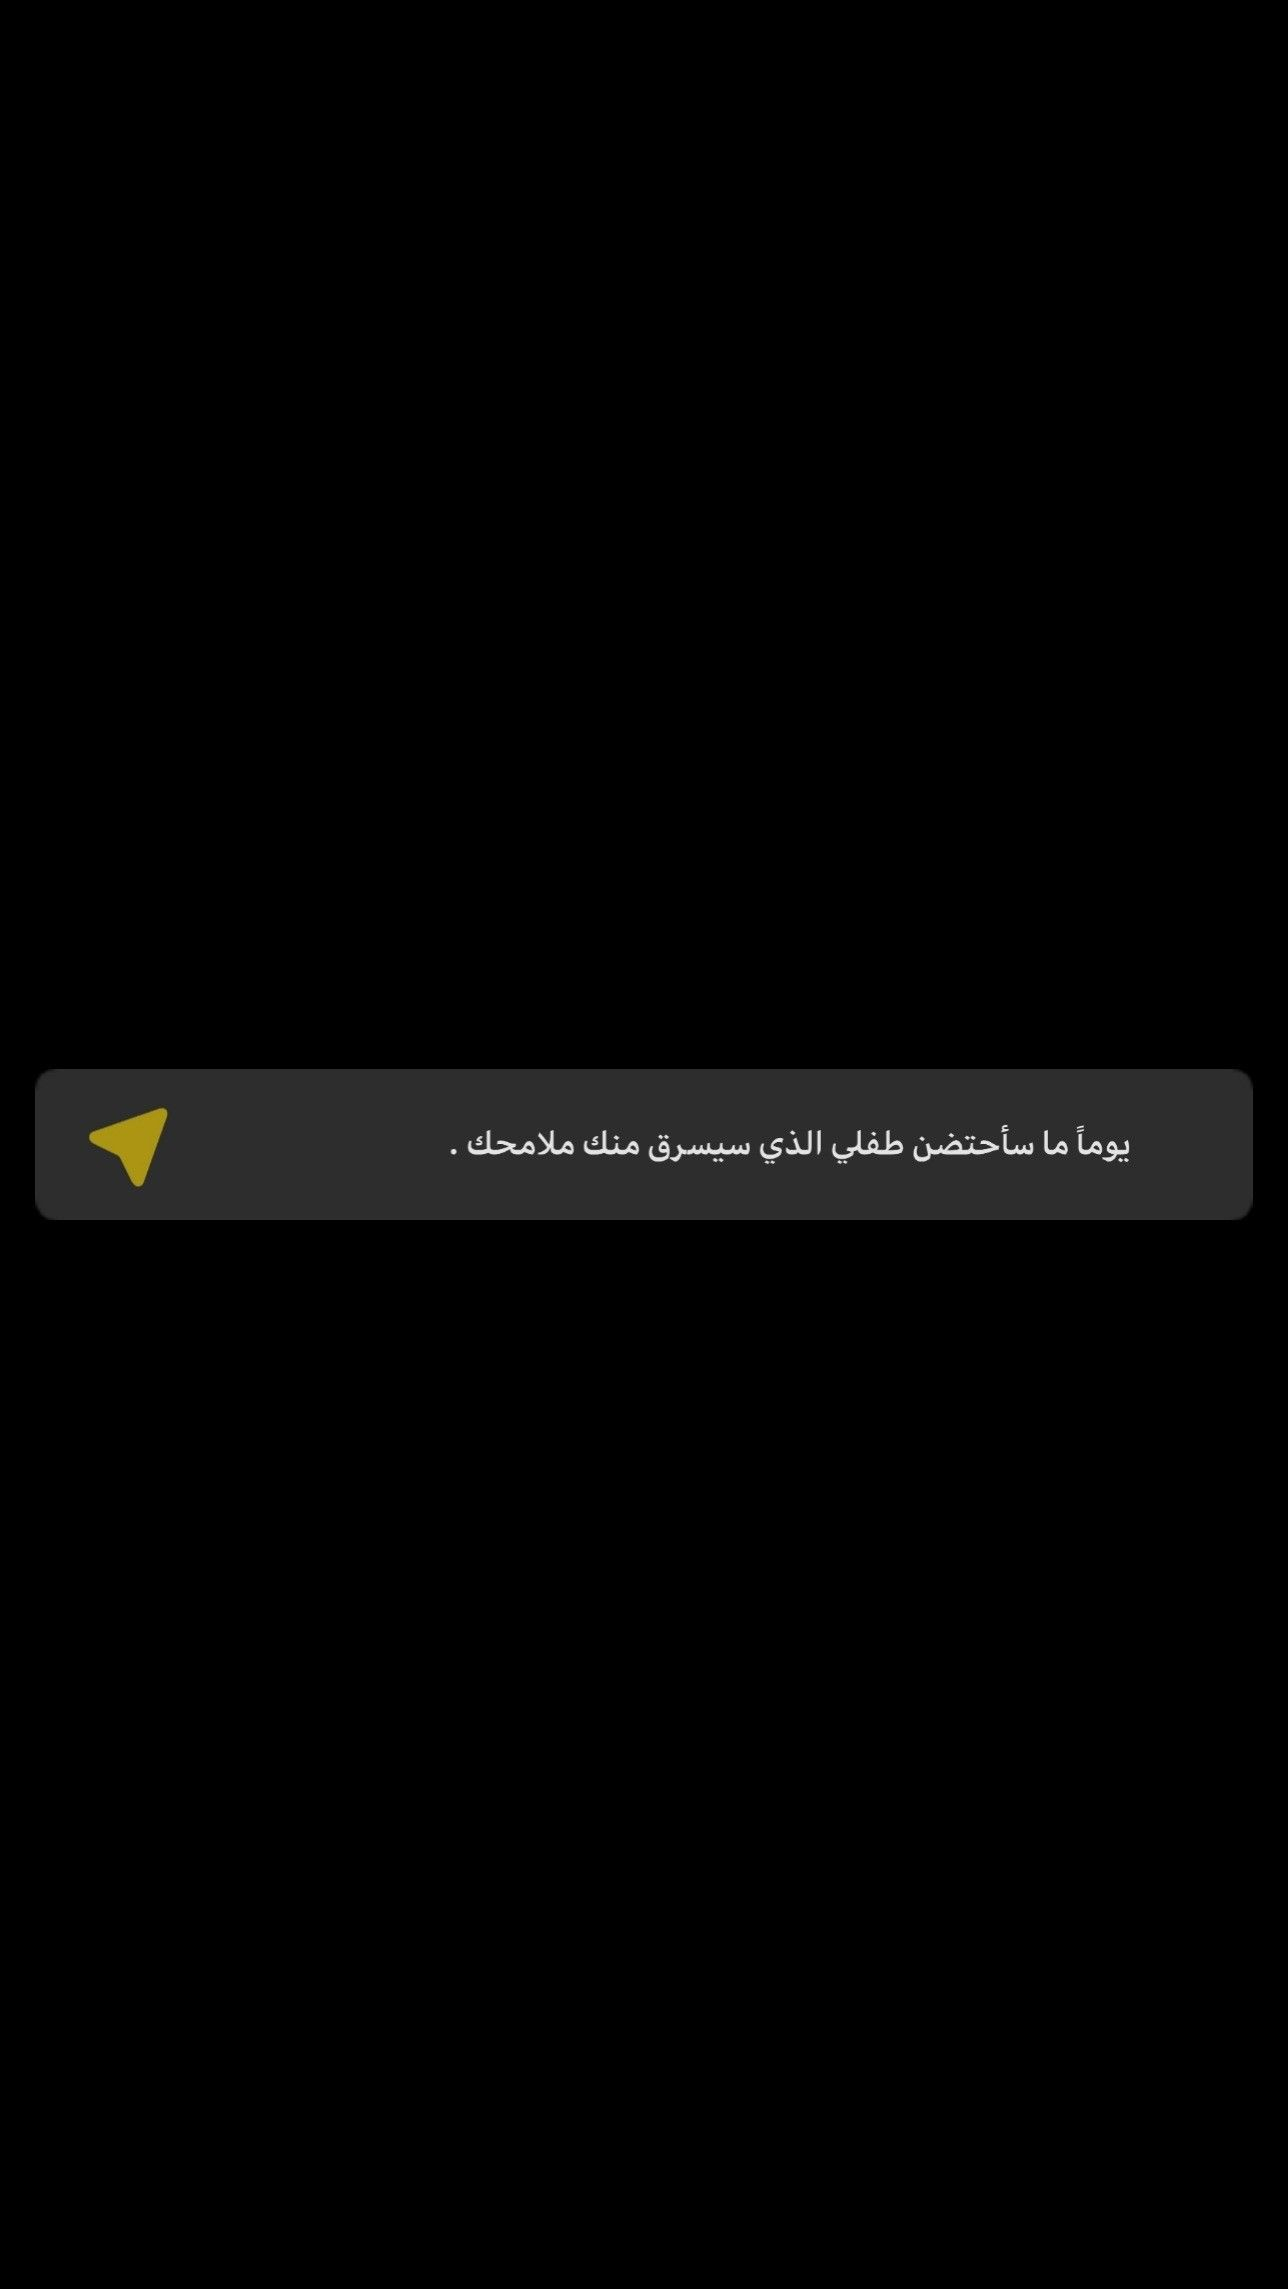 اقتباسات خواطر اشعارات شعور Arabic Love Quotes Talking Quotes Beautiful Arabic Words